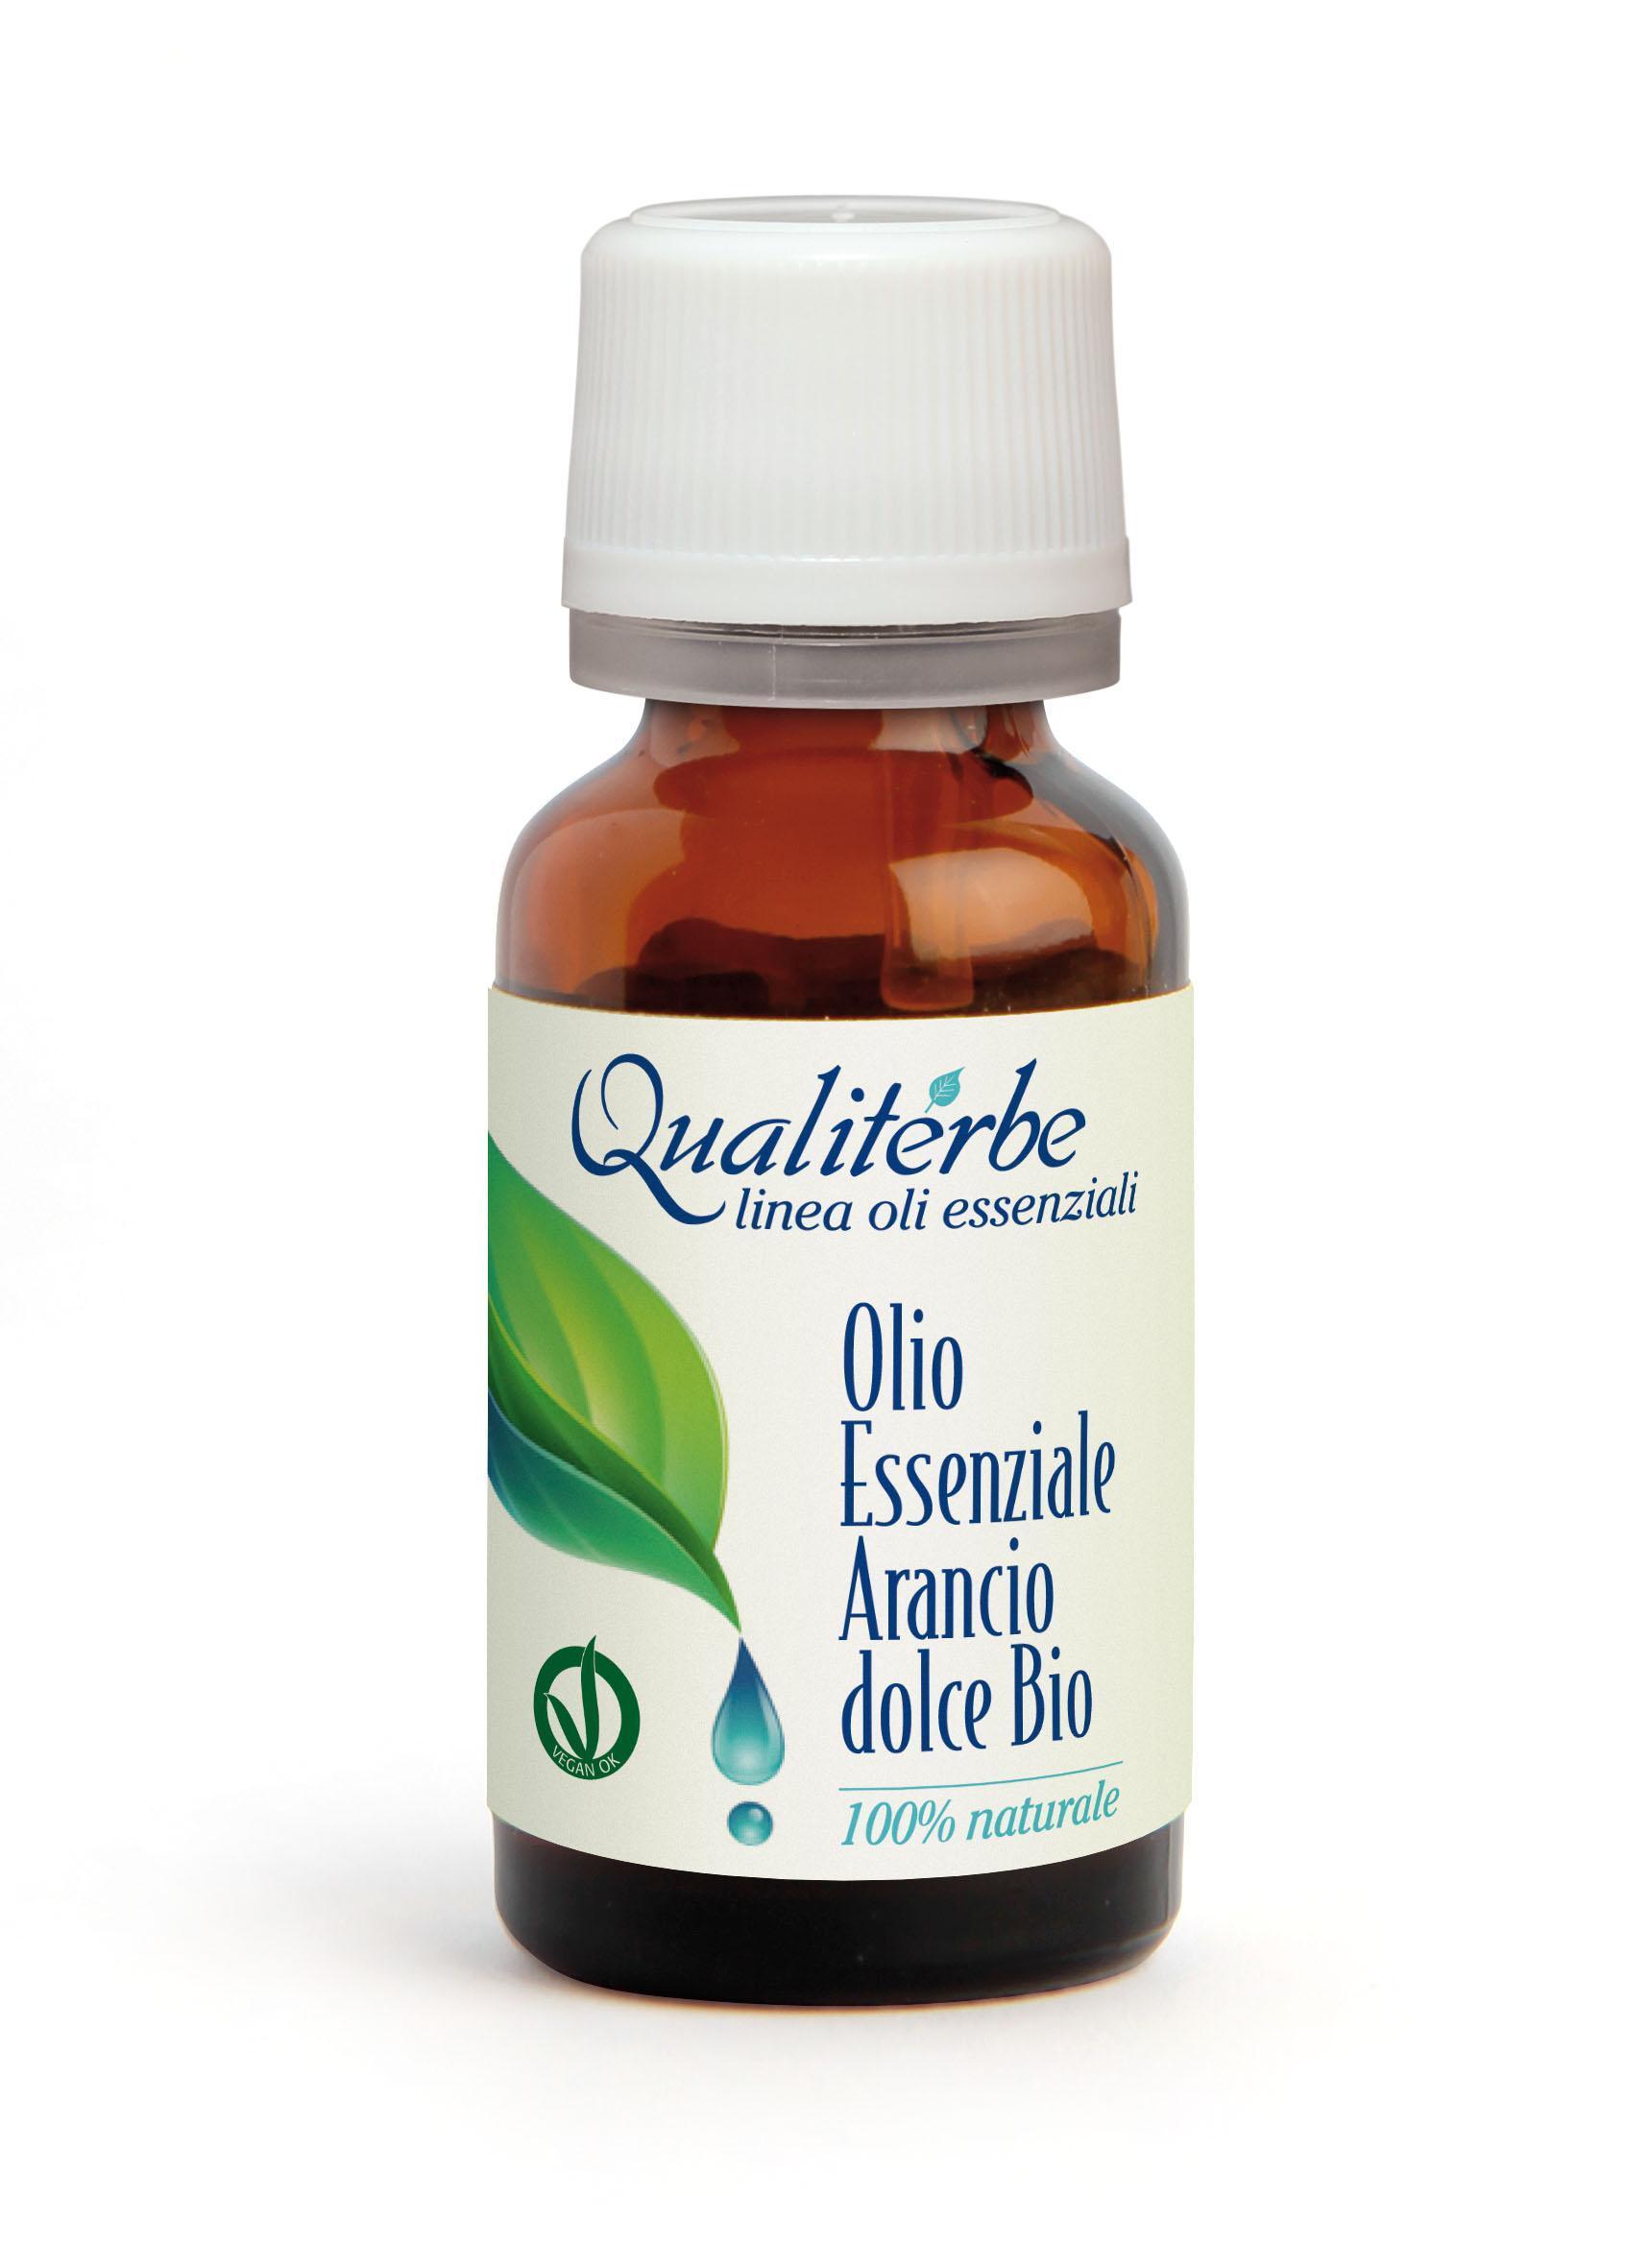 Olio essenziale di Arancio Dolce Bio 10 ml (Vegan Ok)